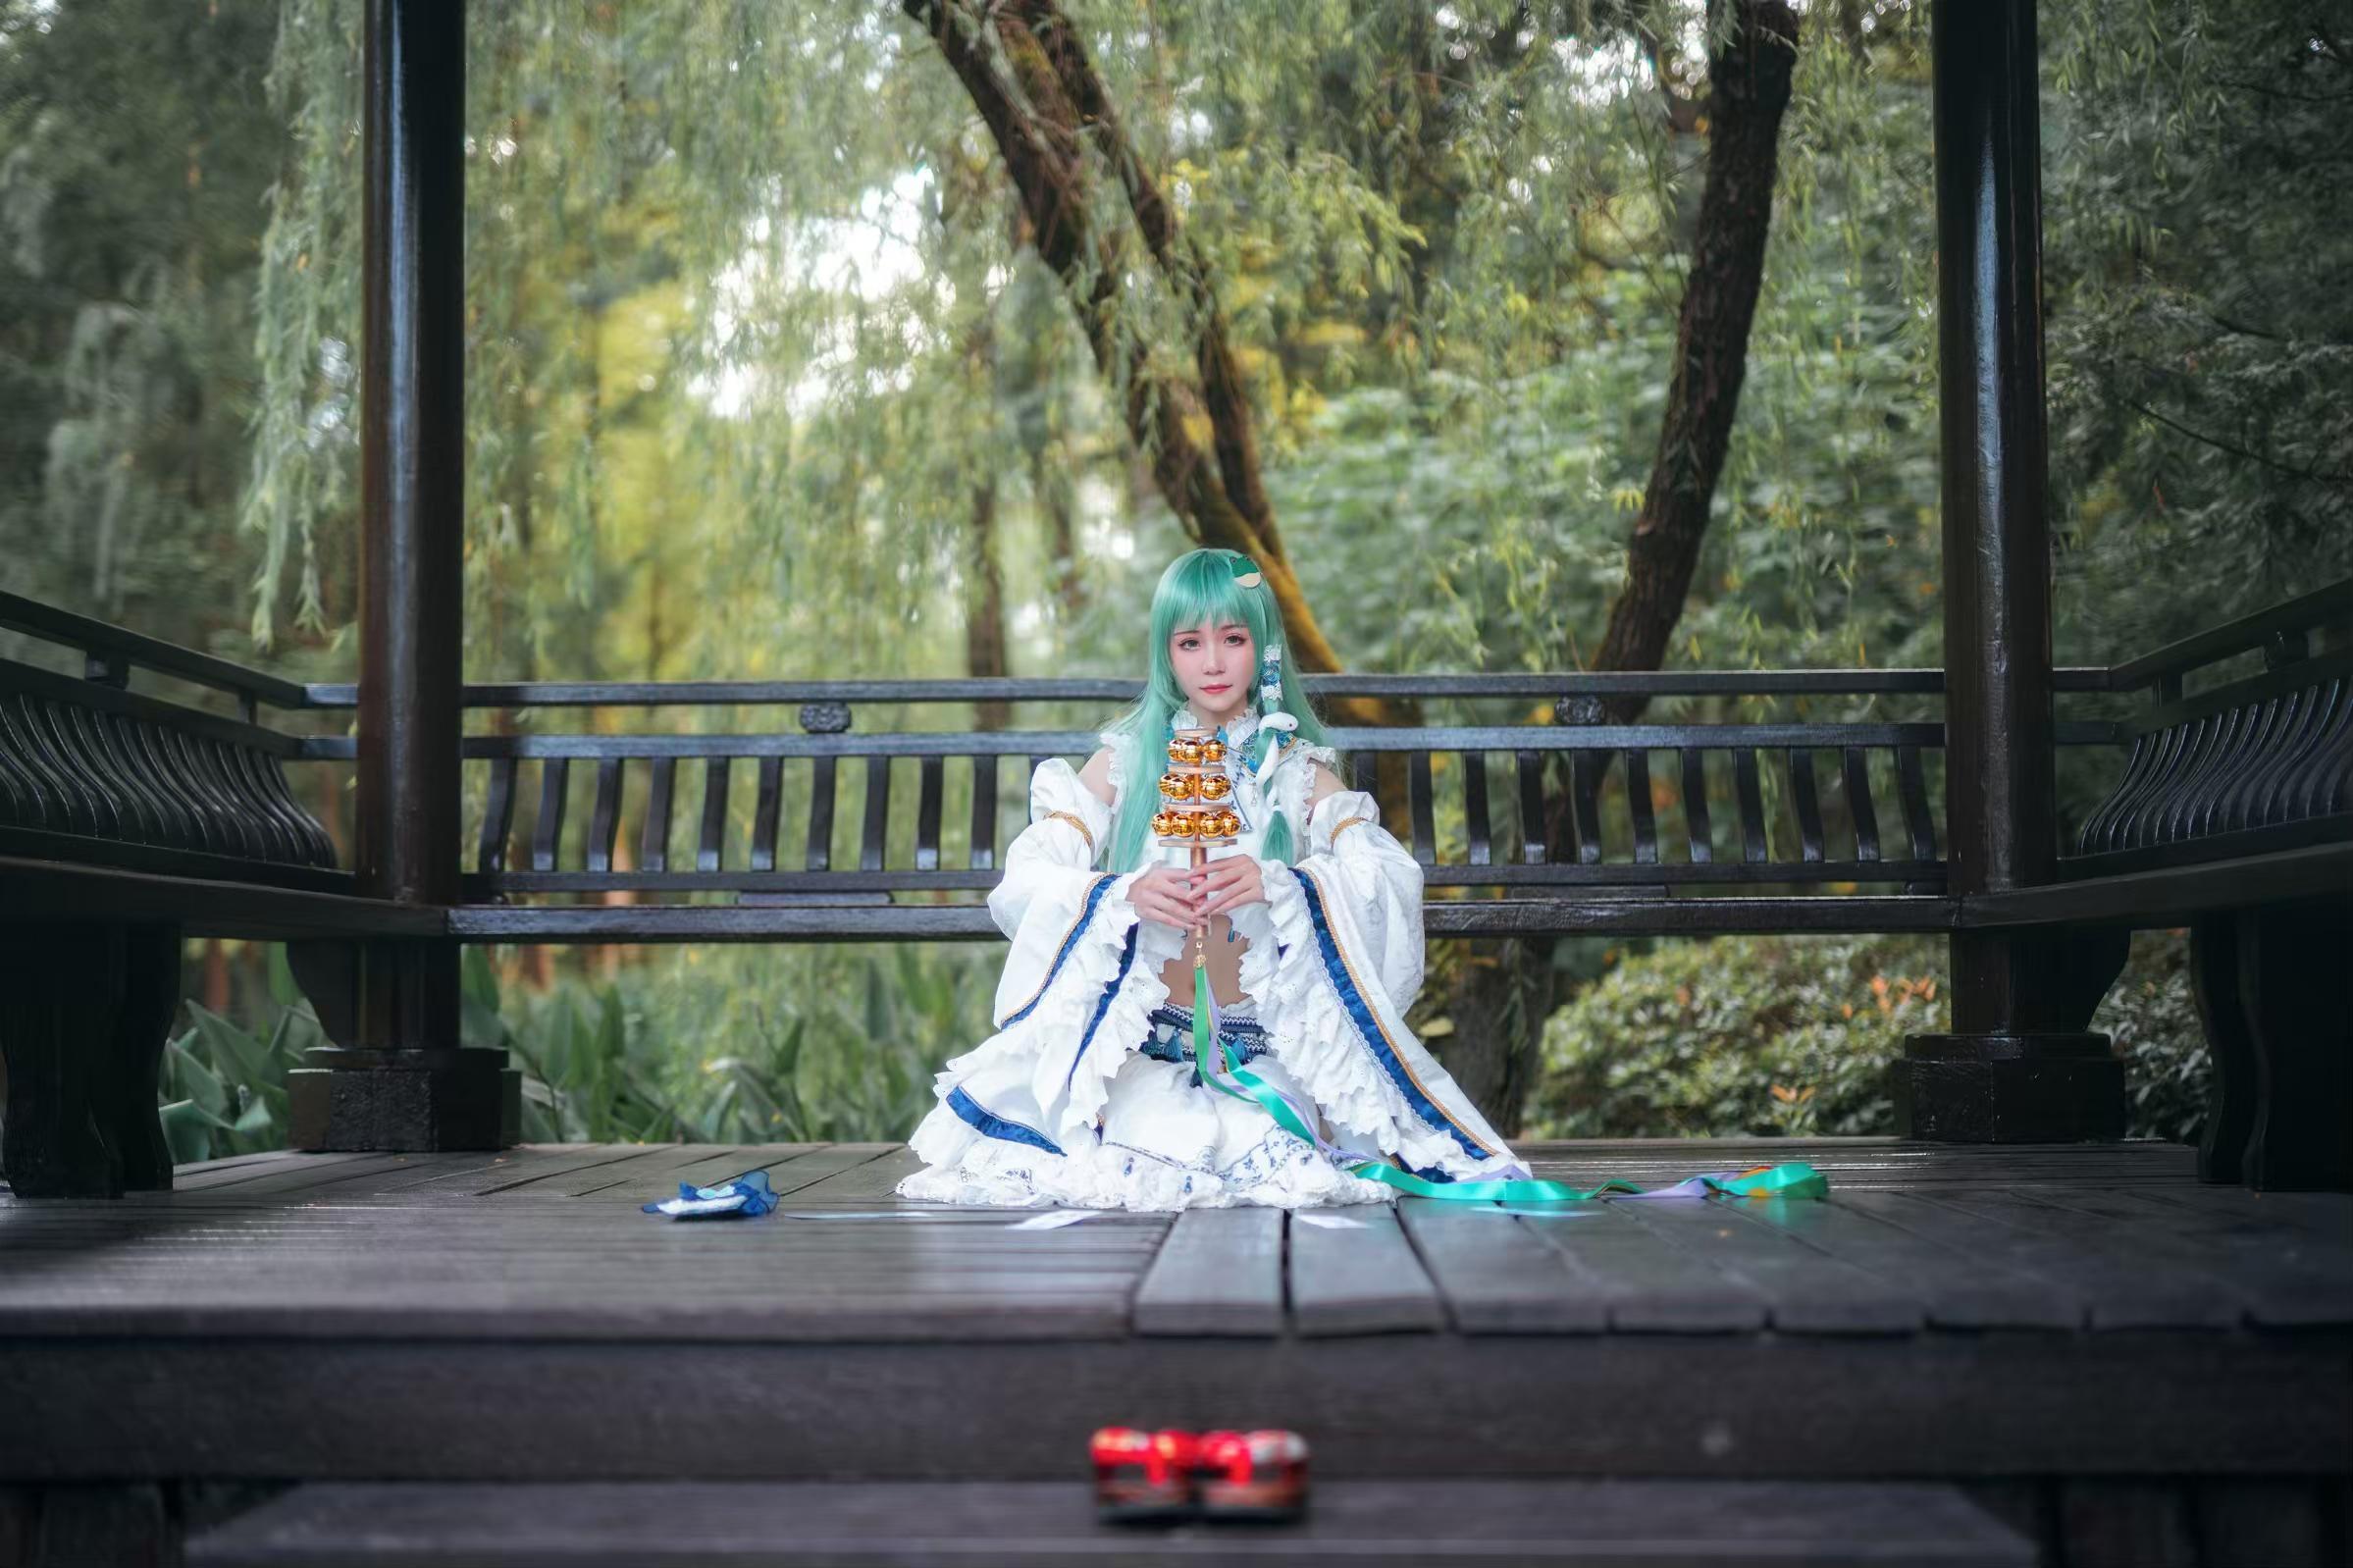 《东方PROJECT》正片cosplay【CN:Rin__】-第7张